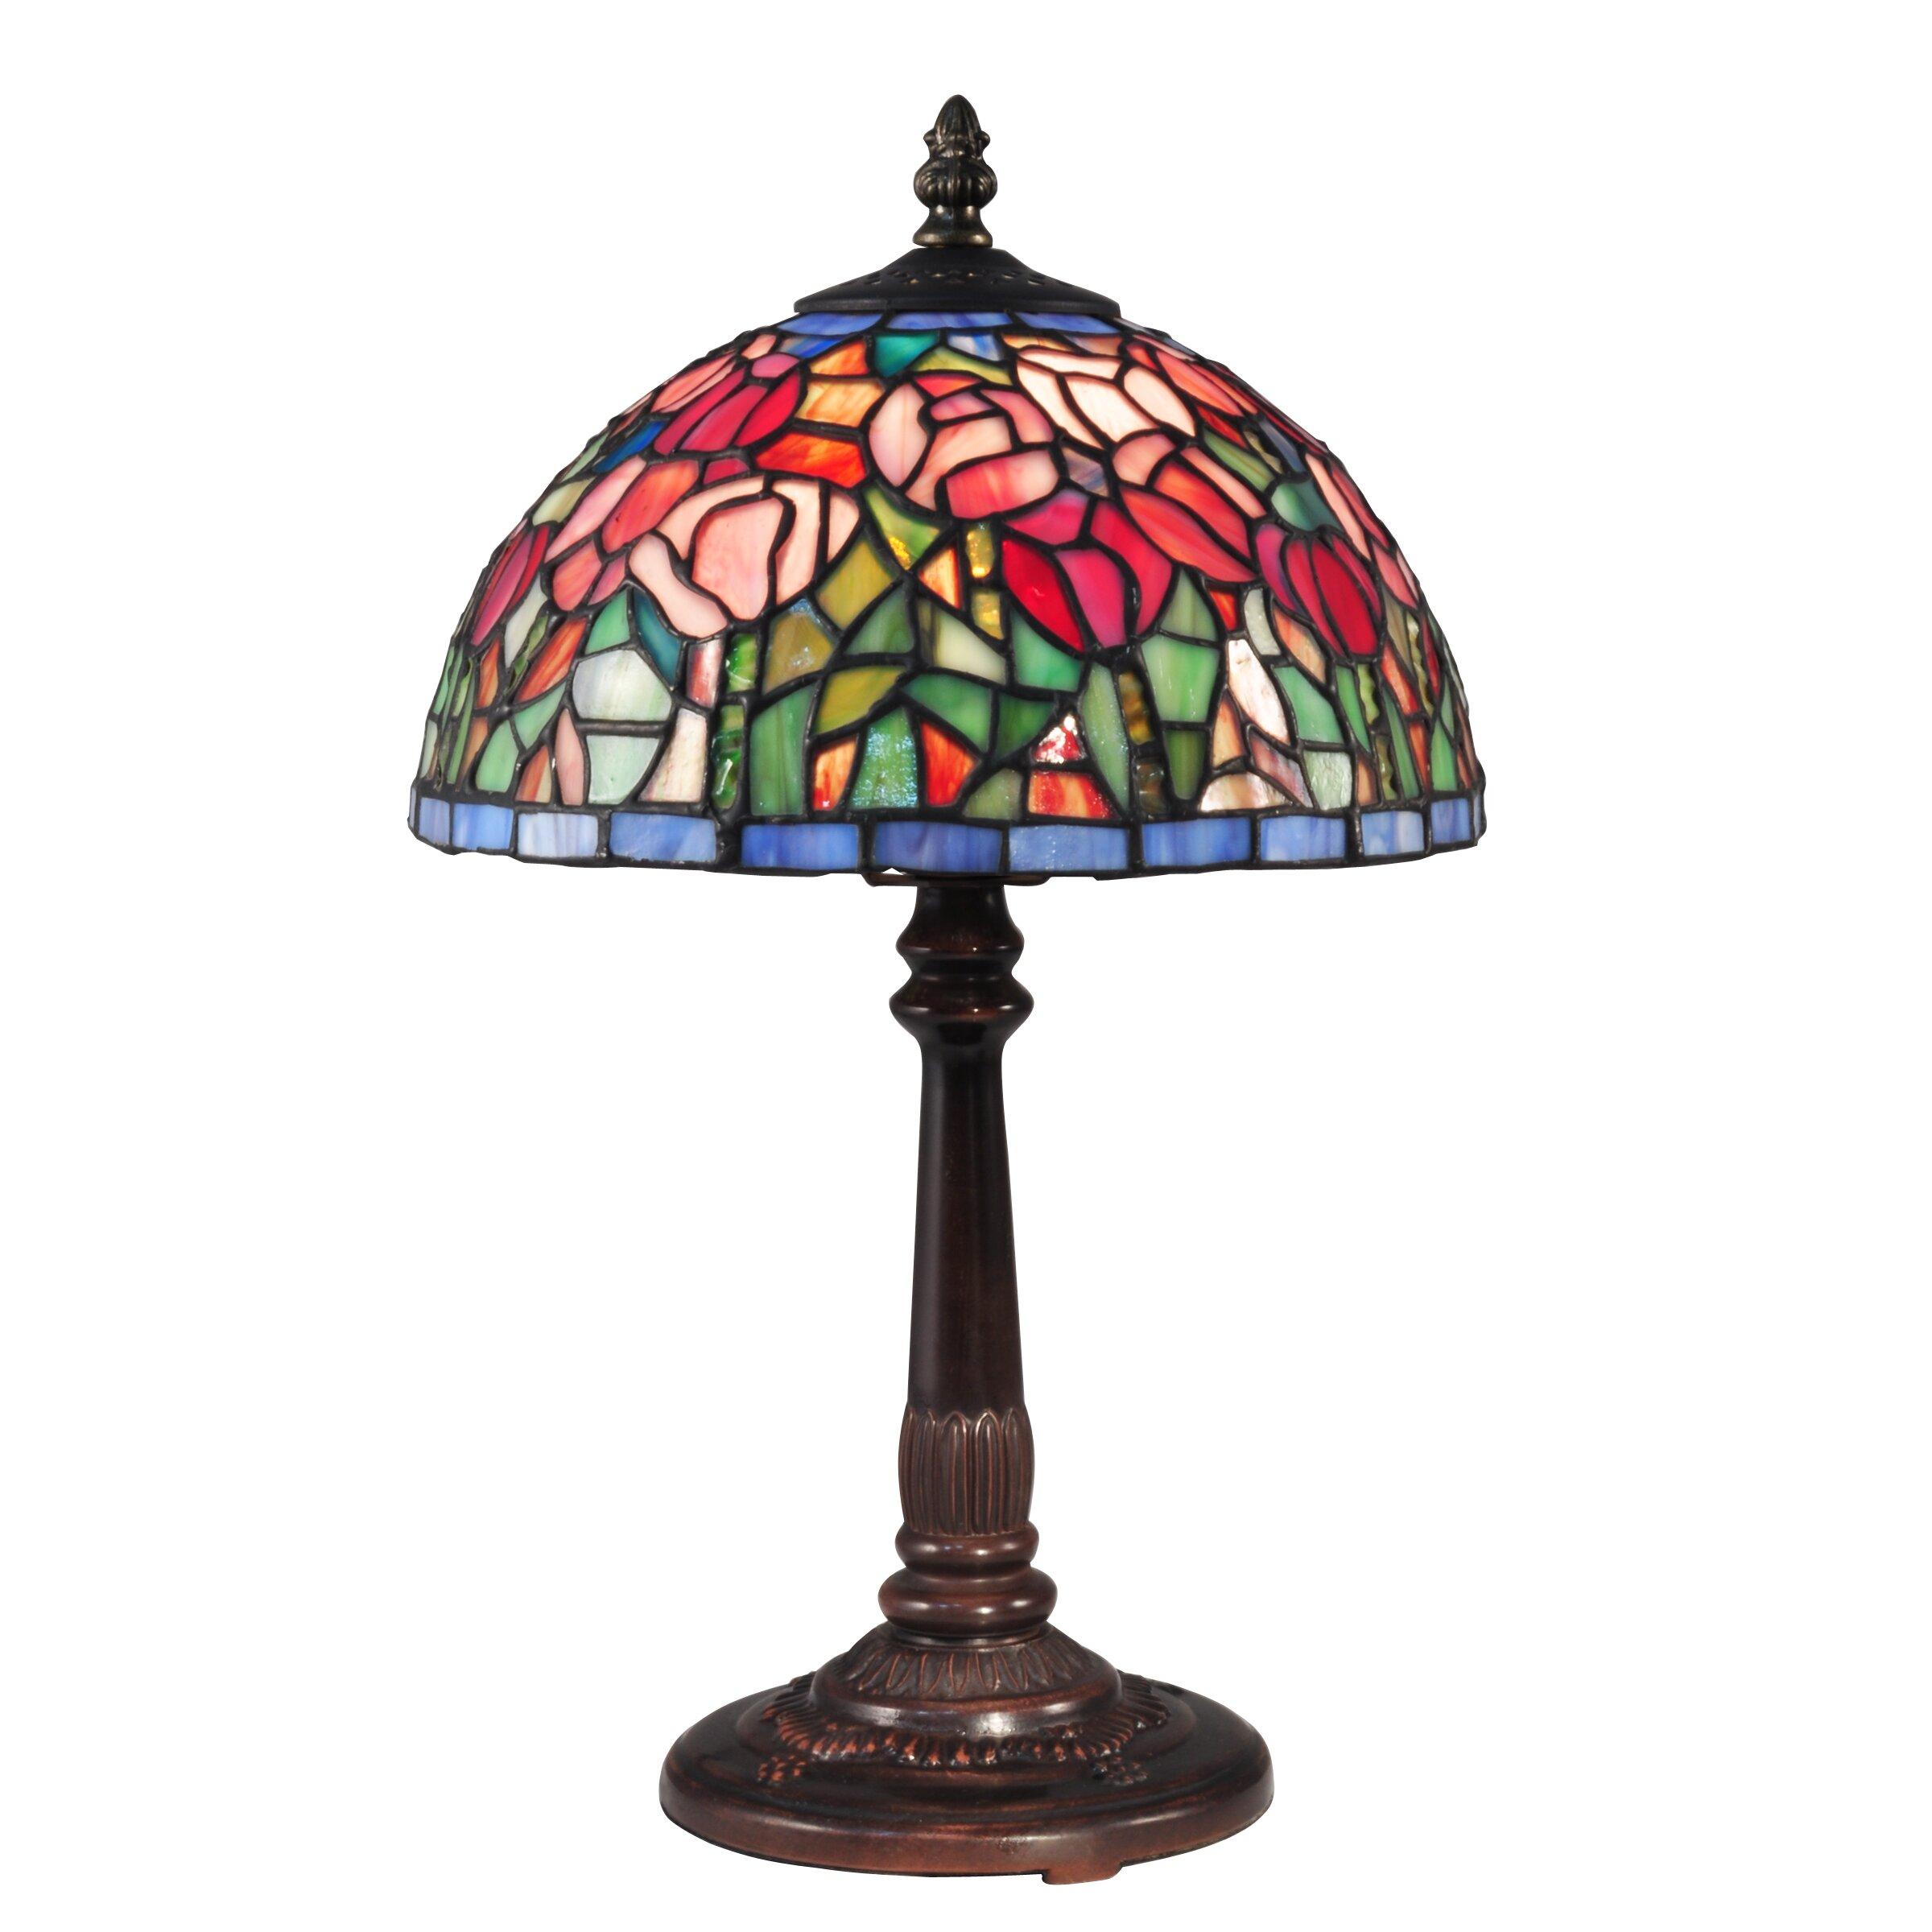 dale tiffany tulip 16 table lamp wayfair. Black Bedroom Furniture Sets. Home Design Ideas